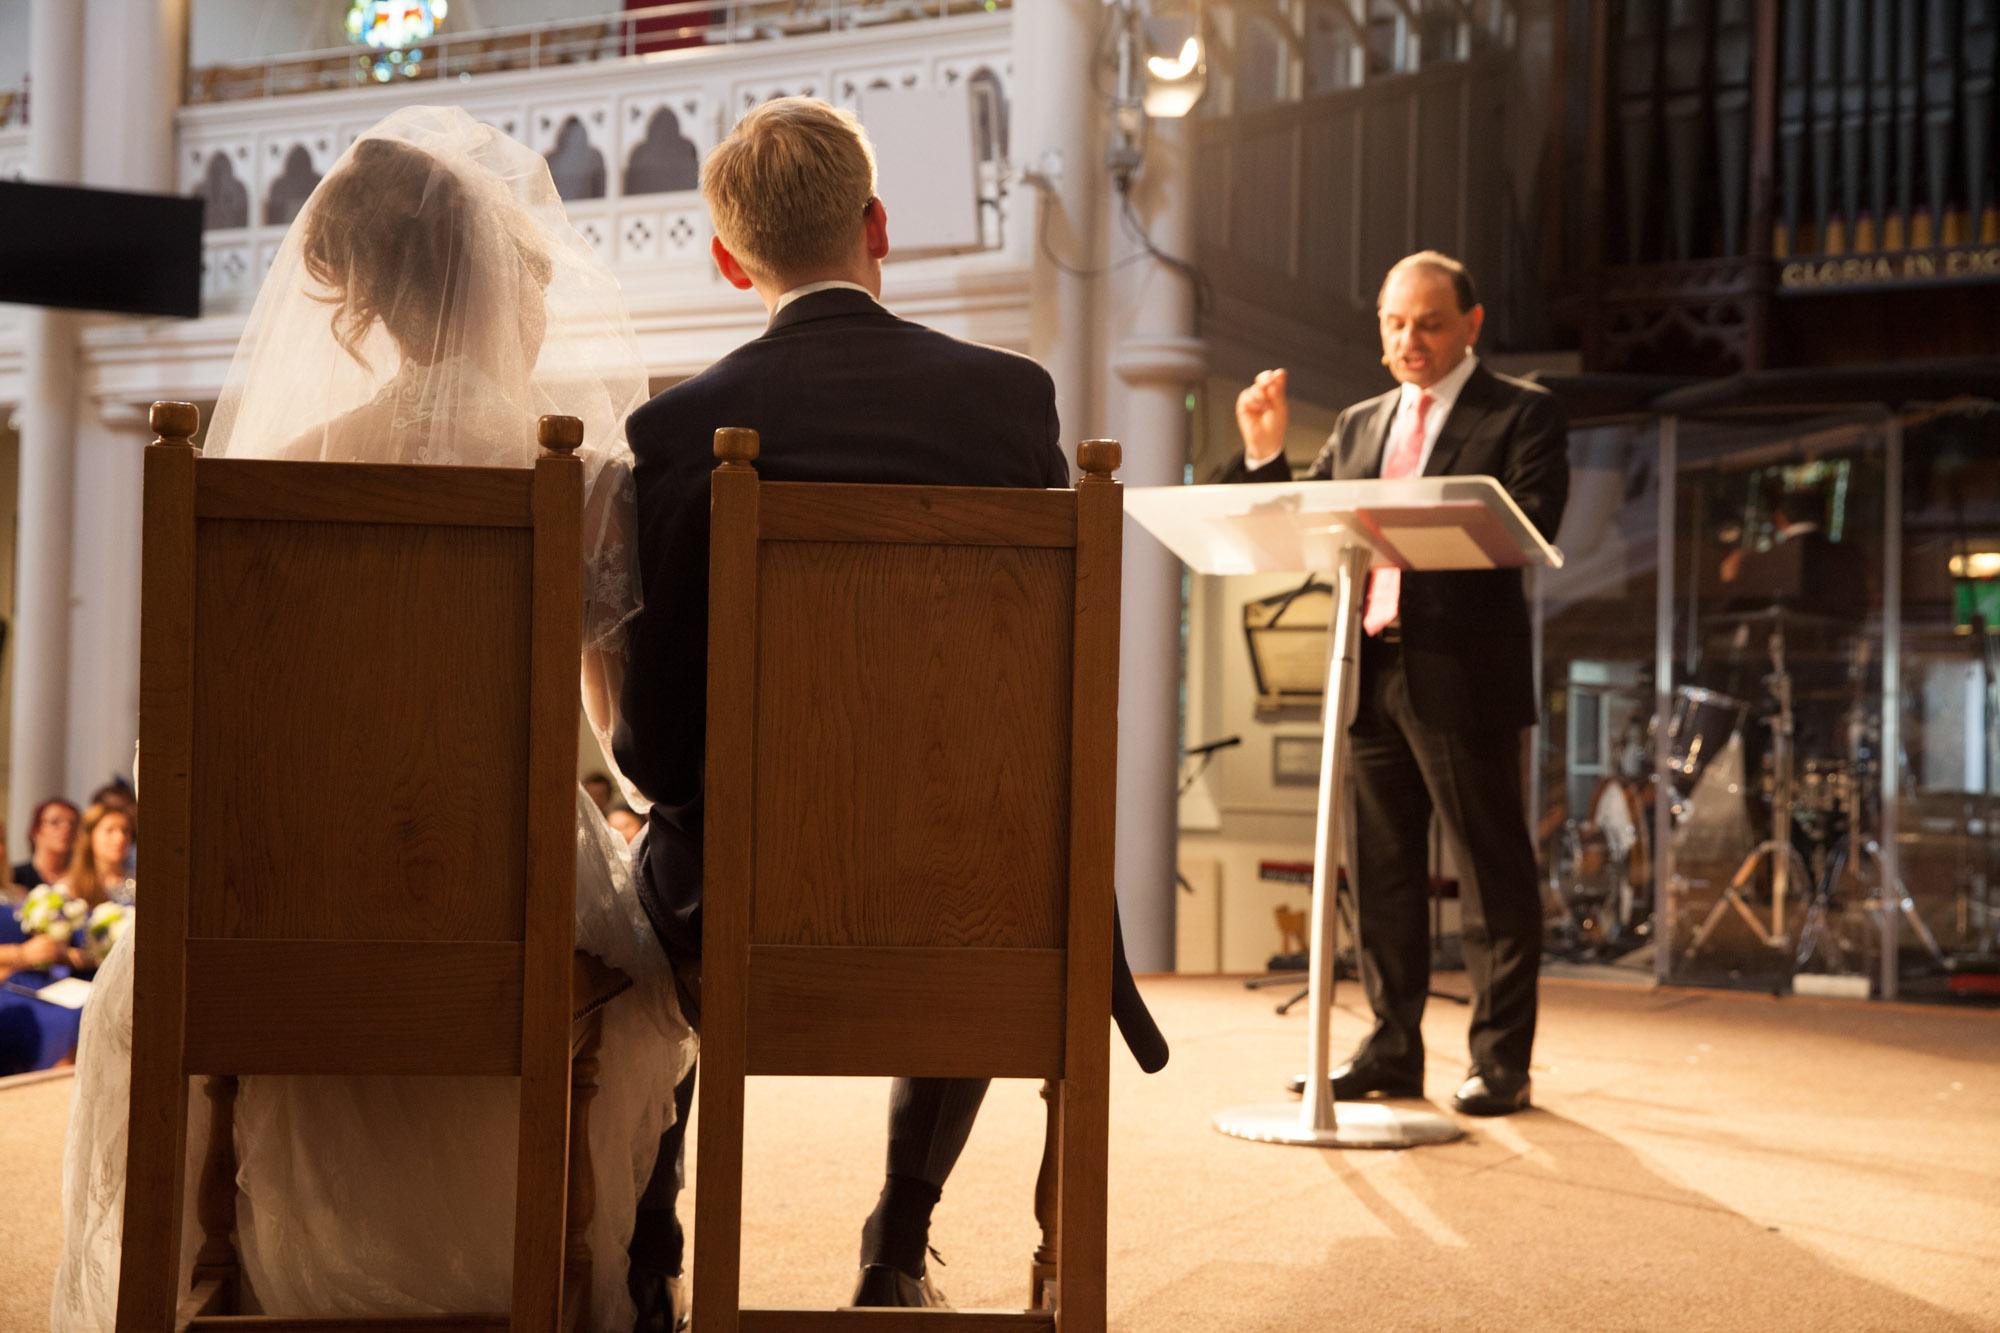 weddings-couples-love-photographer-oxford-london-jonathan-self-photography-35.jpg